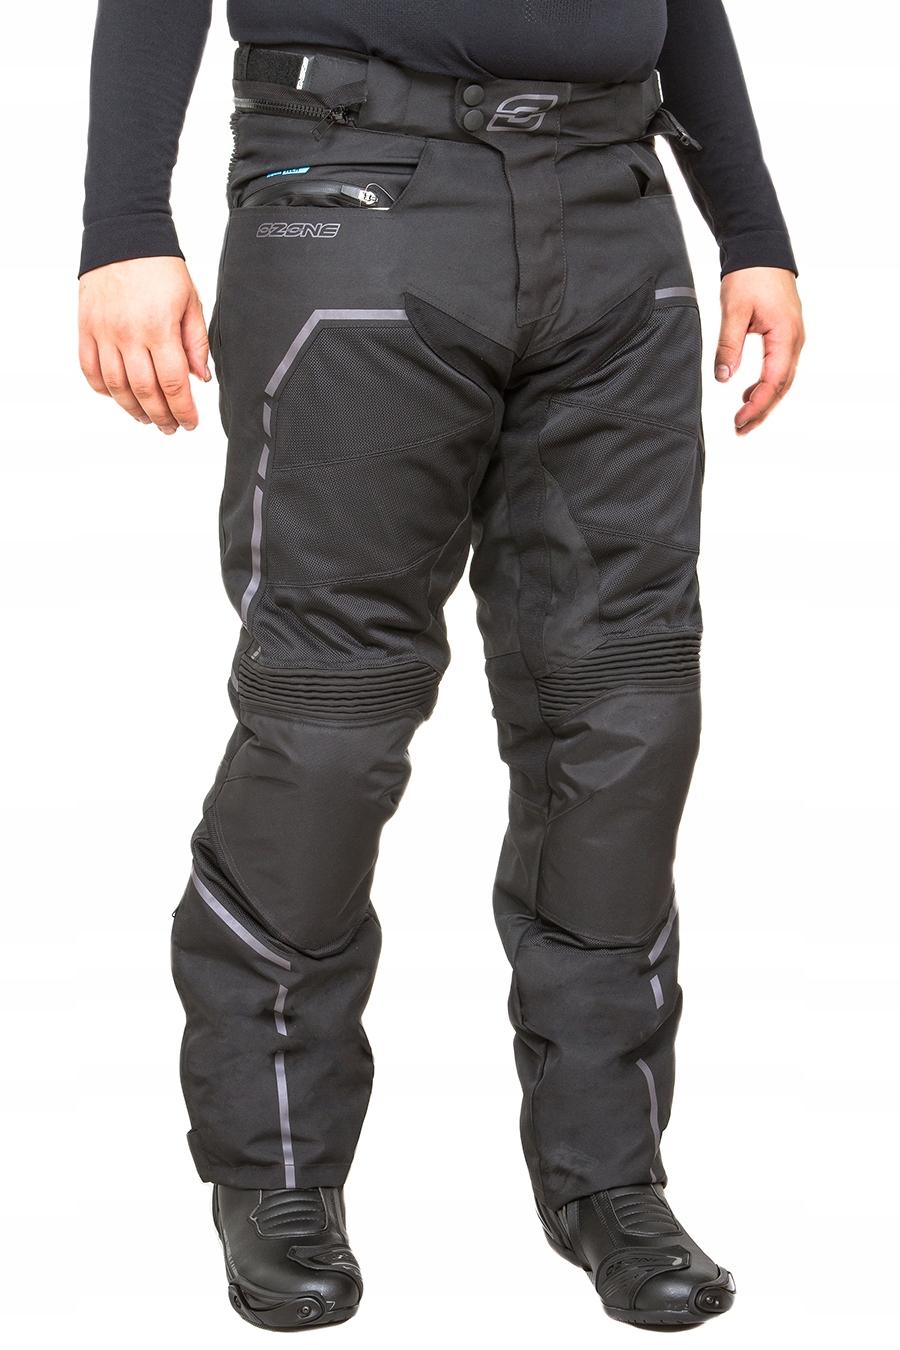 Tesktylne штаны мотоциклетные ozone jet 5xl, фото 0